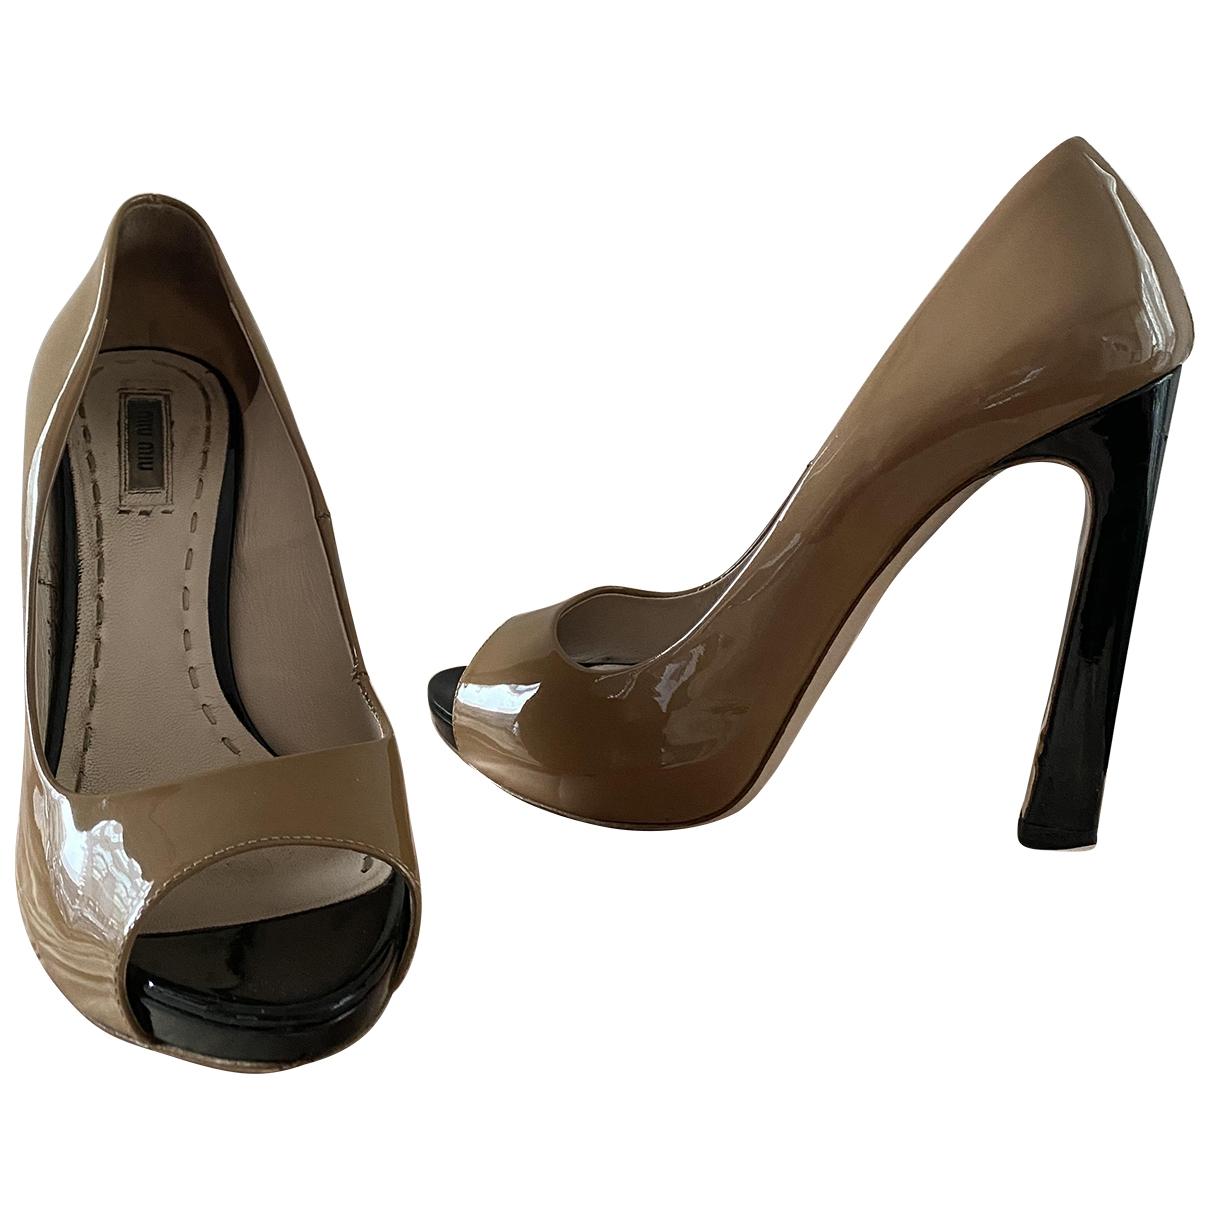 Miu Miu \N Beige Leather Heels for Women 41 EU